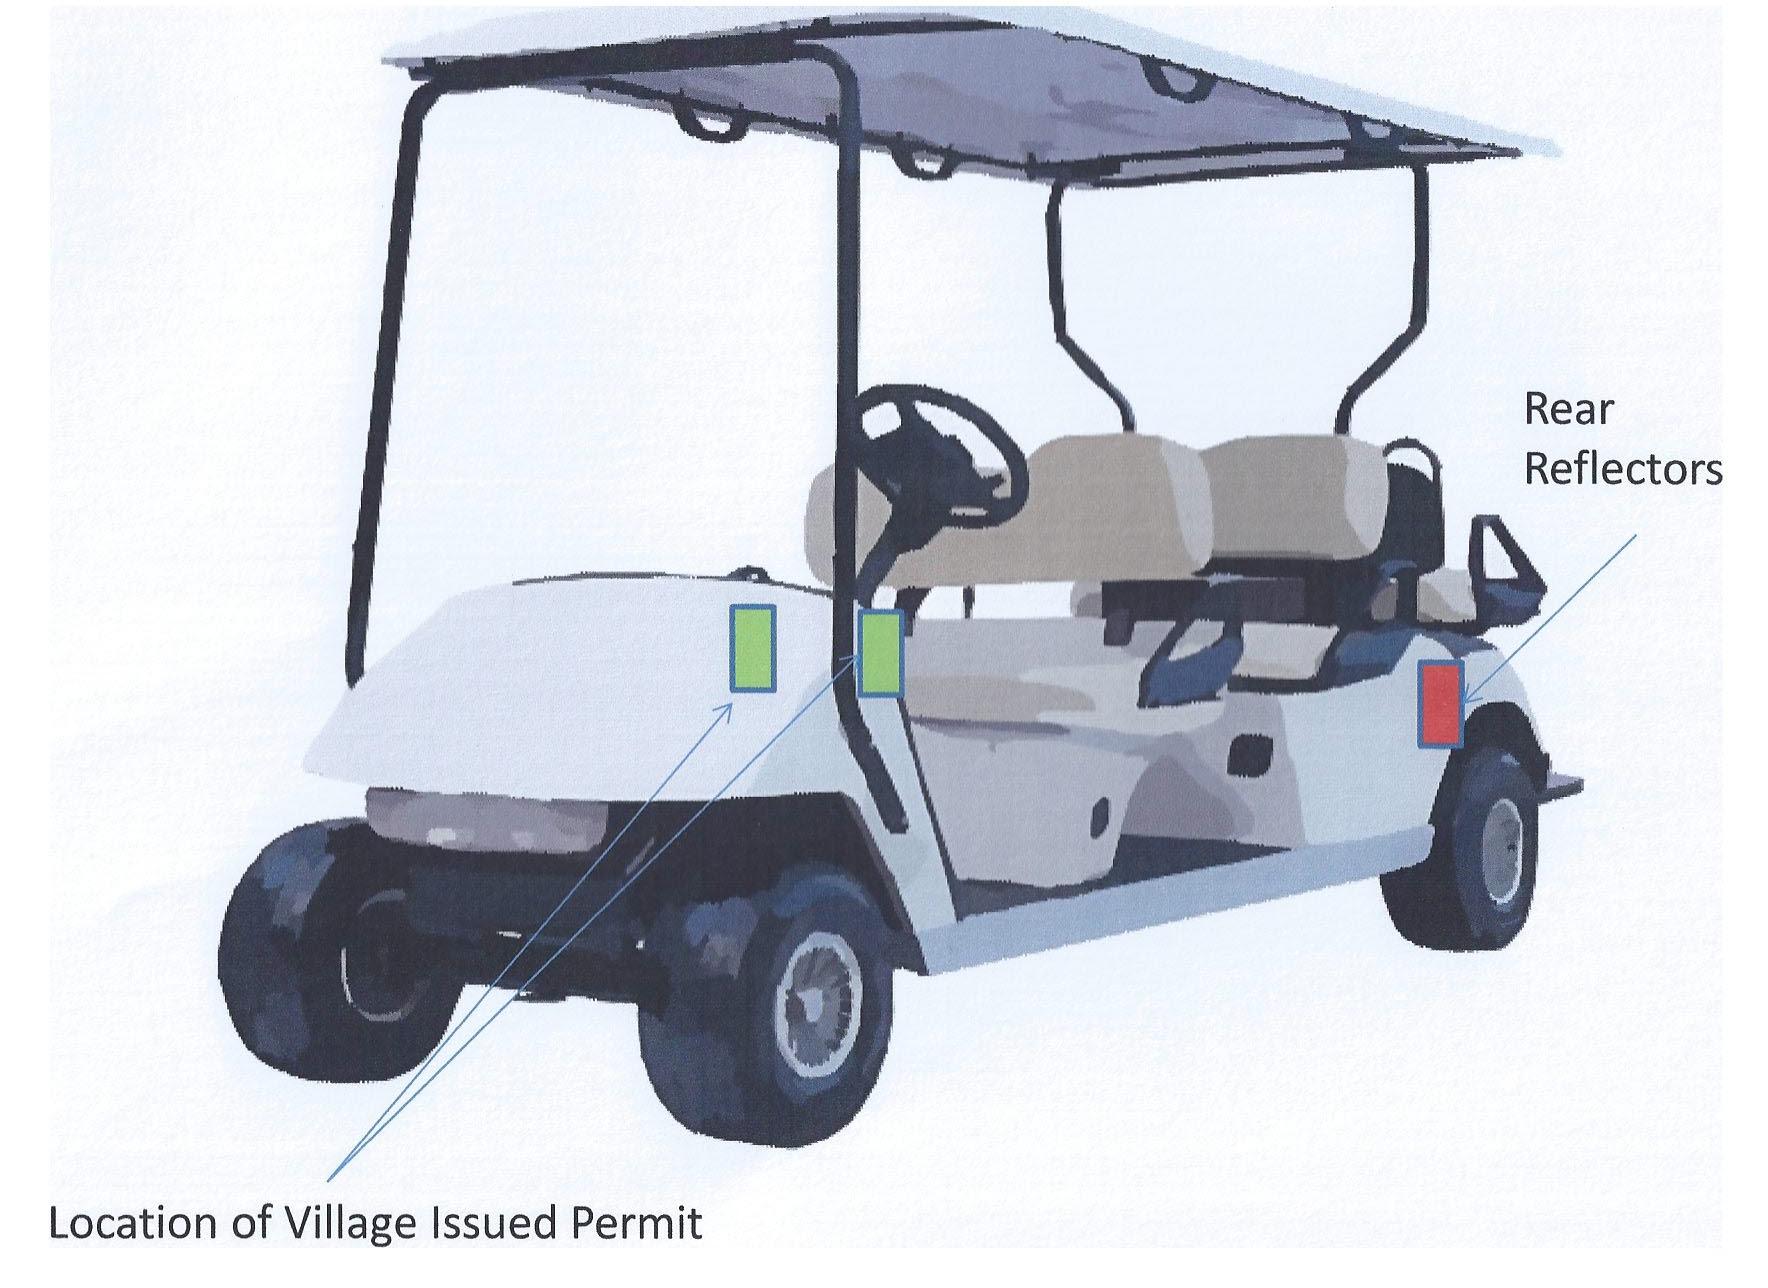 Golf Cart Permit Page Plywood Golf Cart on brick cart, roofing cart, moving cart, drywall cart, material cart, firewood cart, portable air compressor cart, door cart, construction cart, paper cart, shopping cart, sand cart, build a rolling shop cart, panel cart, 2 wheel cart, stone cart, aluminum cart, cardboard cart, wood cart, concrete cart,